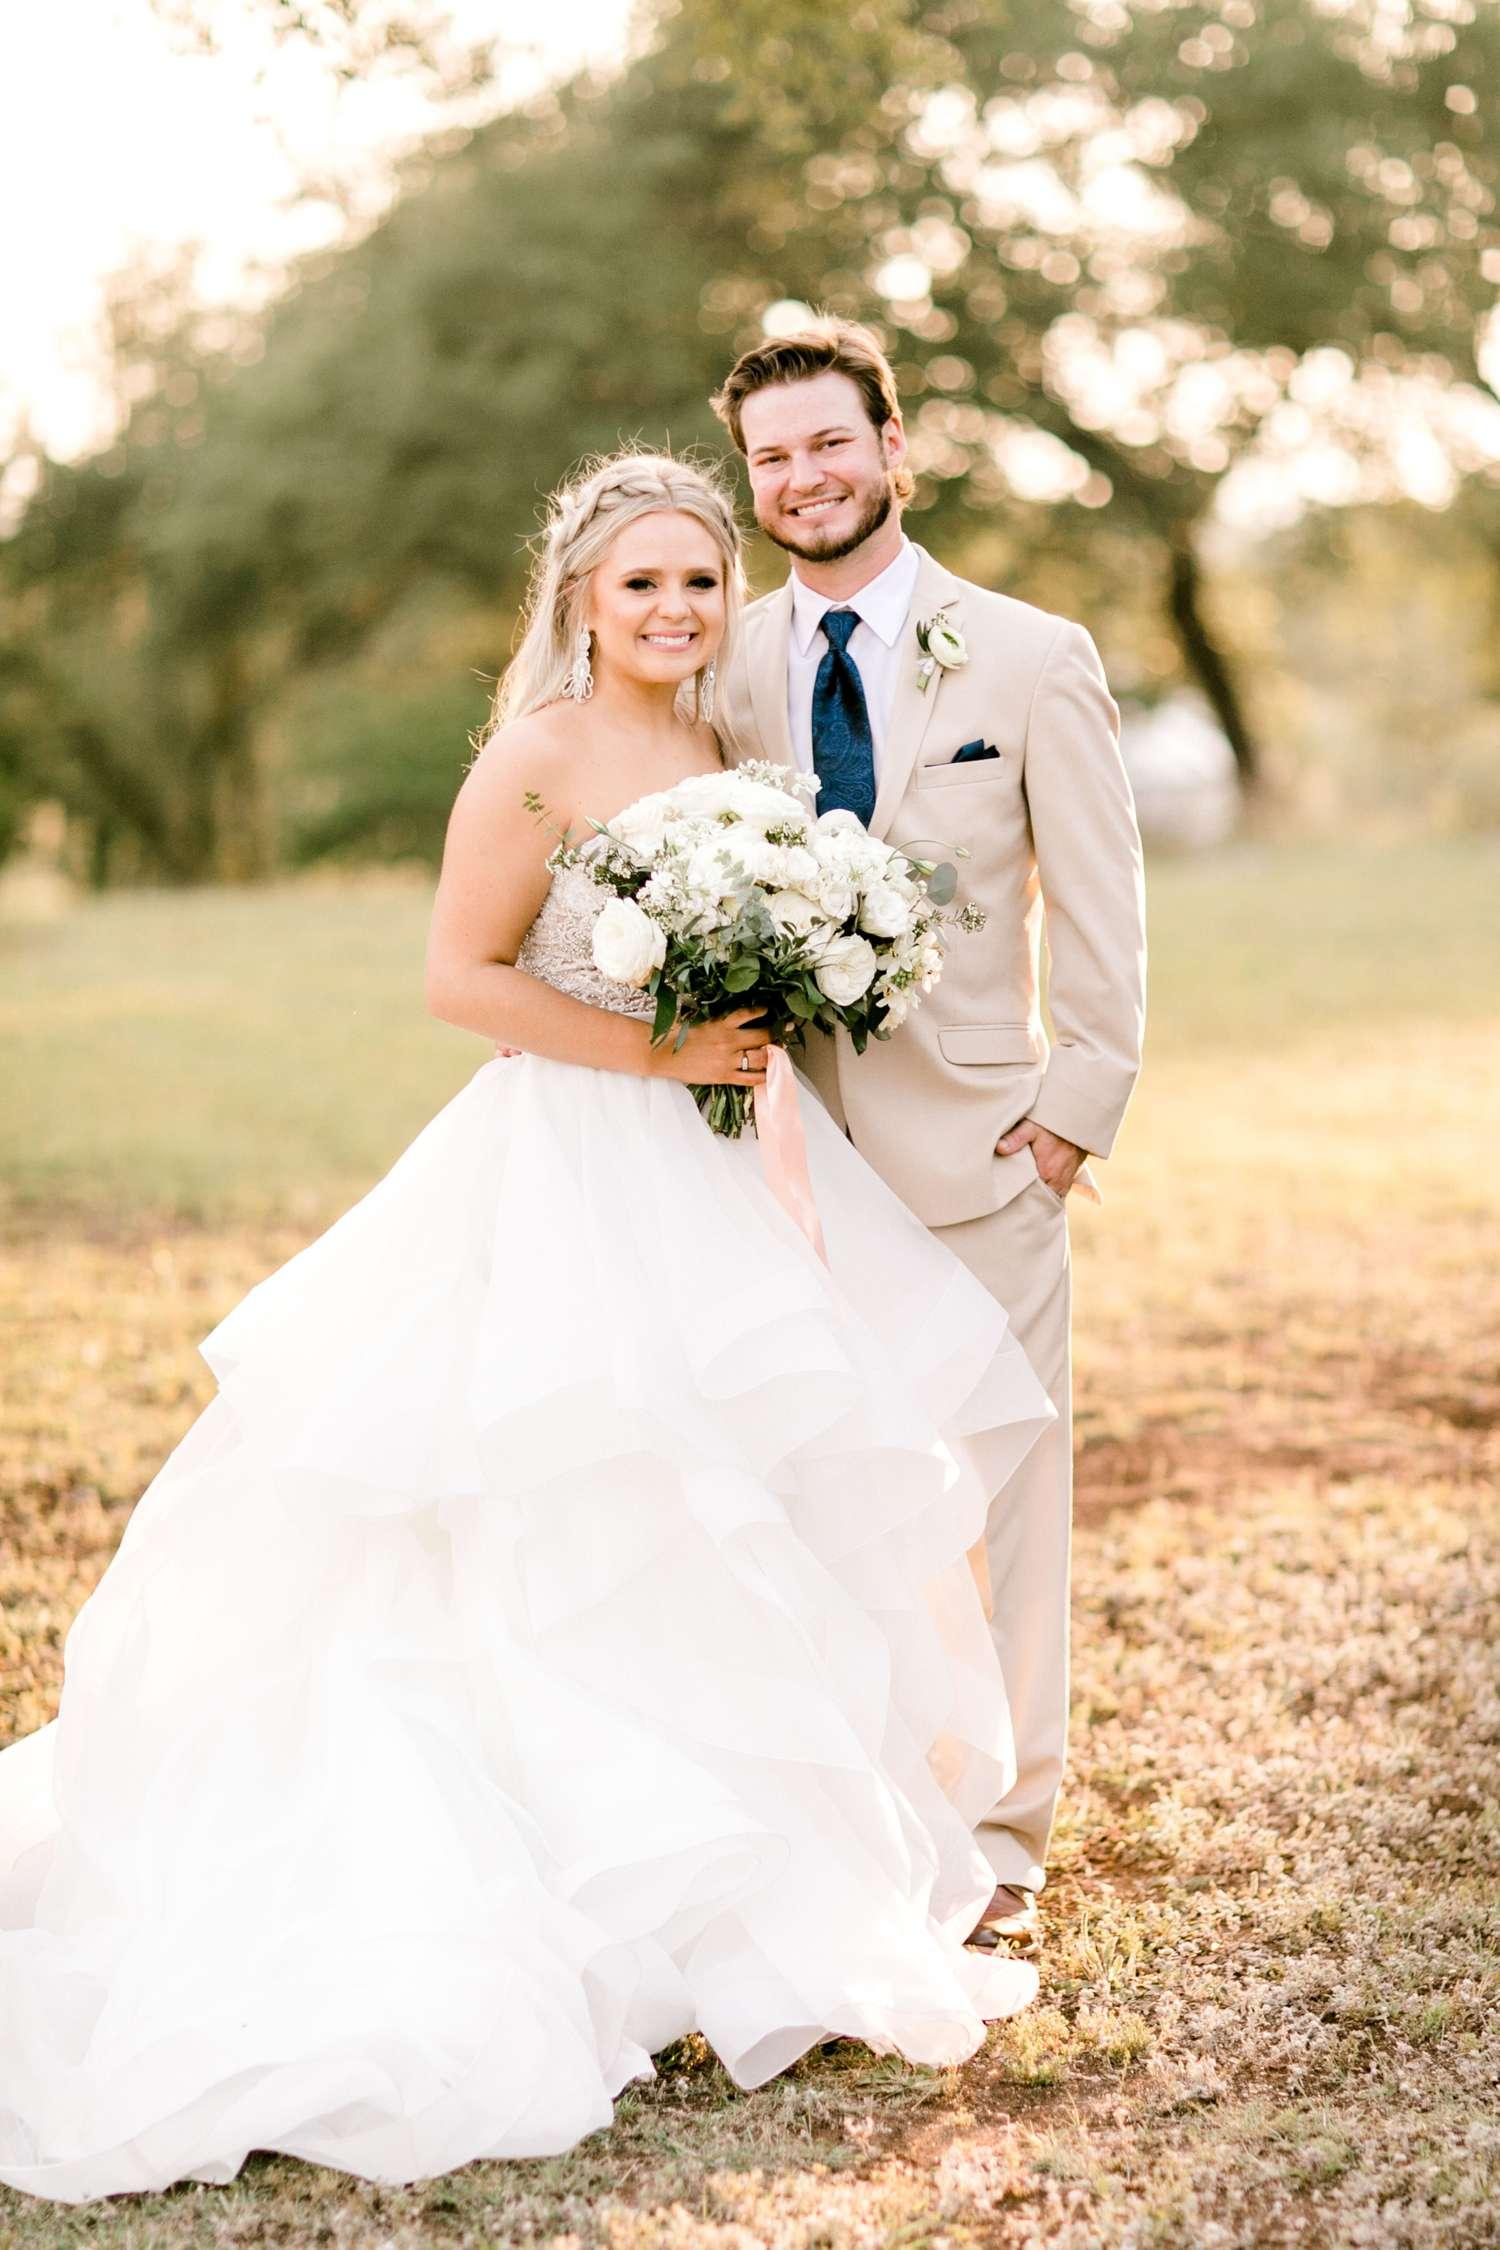 HAYLEE+JUSTIN+GREGORY+HERITAGE_HAUS_AUSTIN_TEXAS_WEDDING_0134.jpg